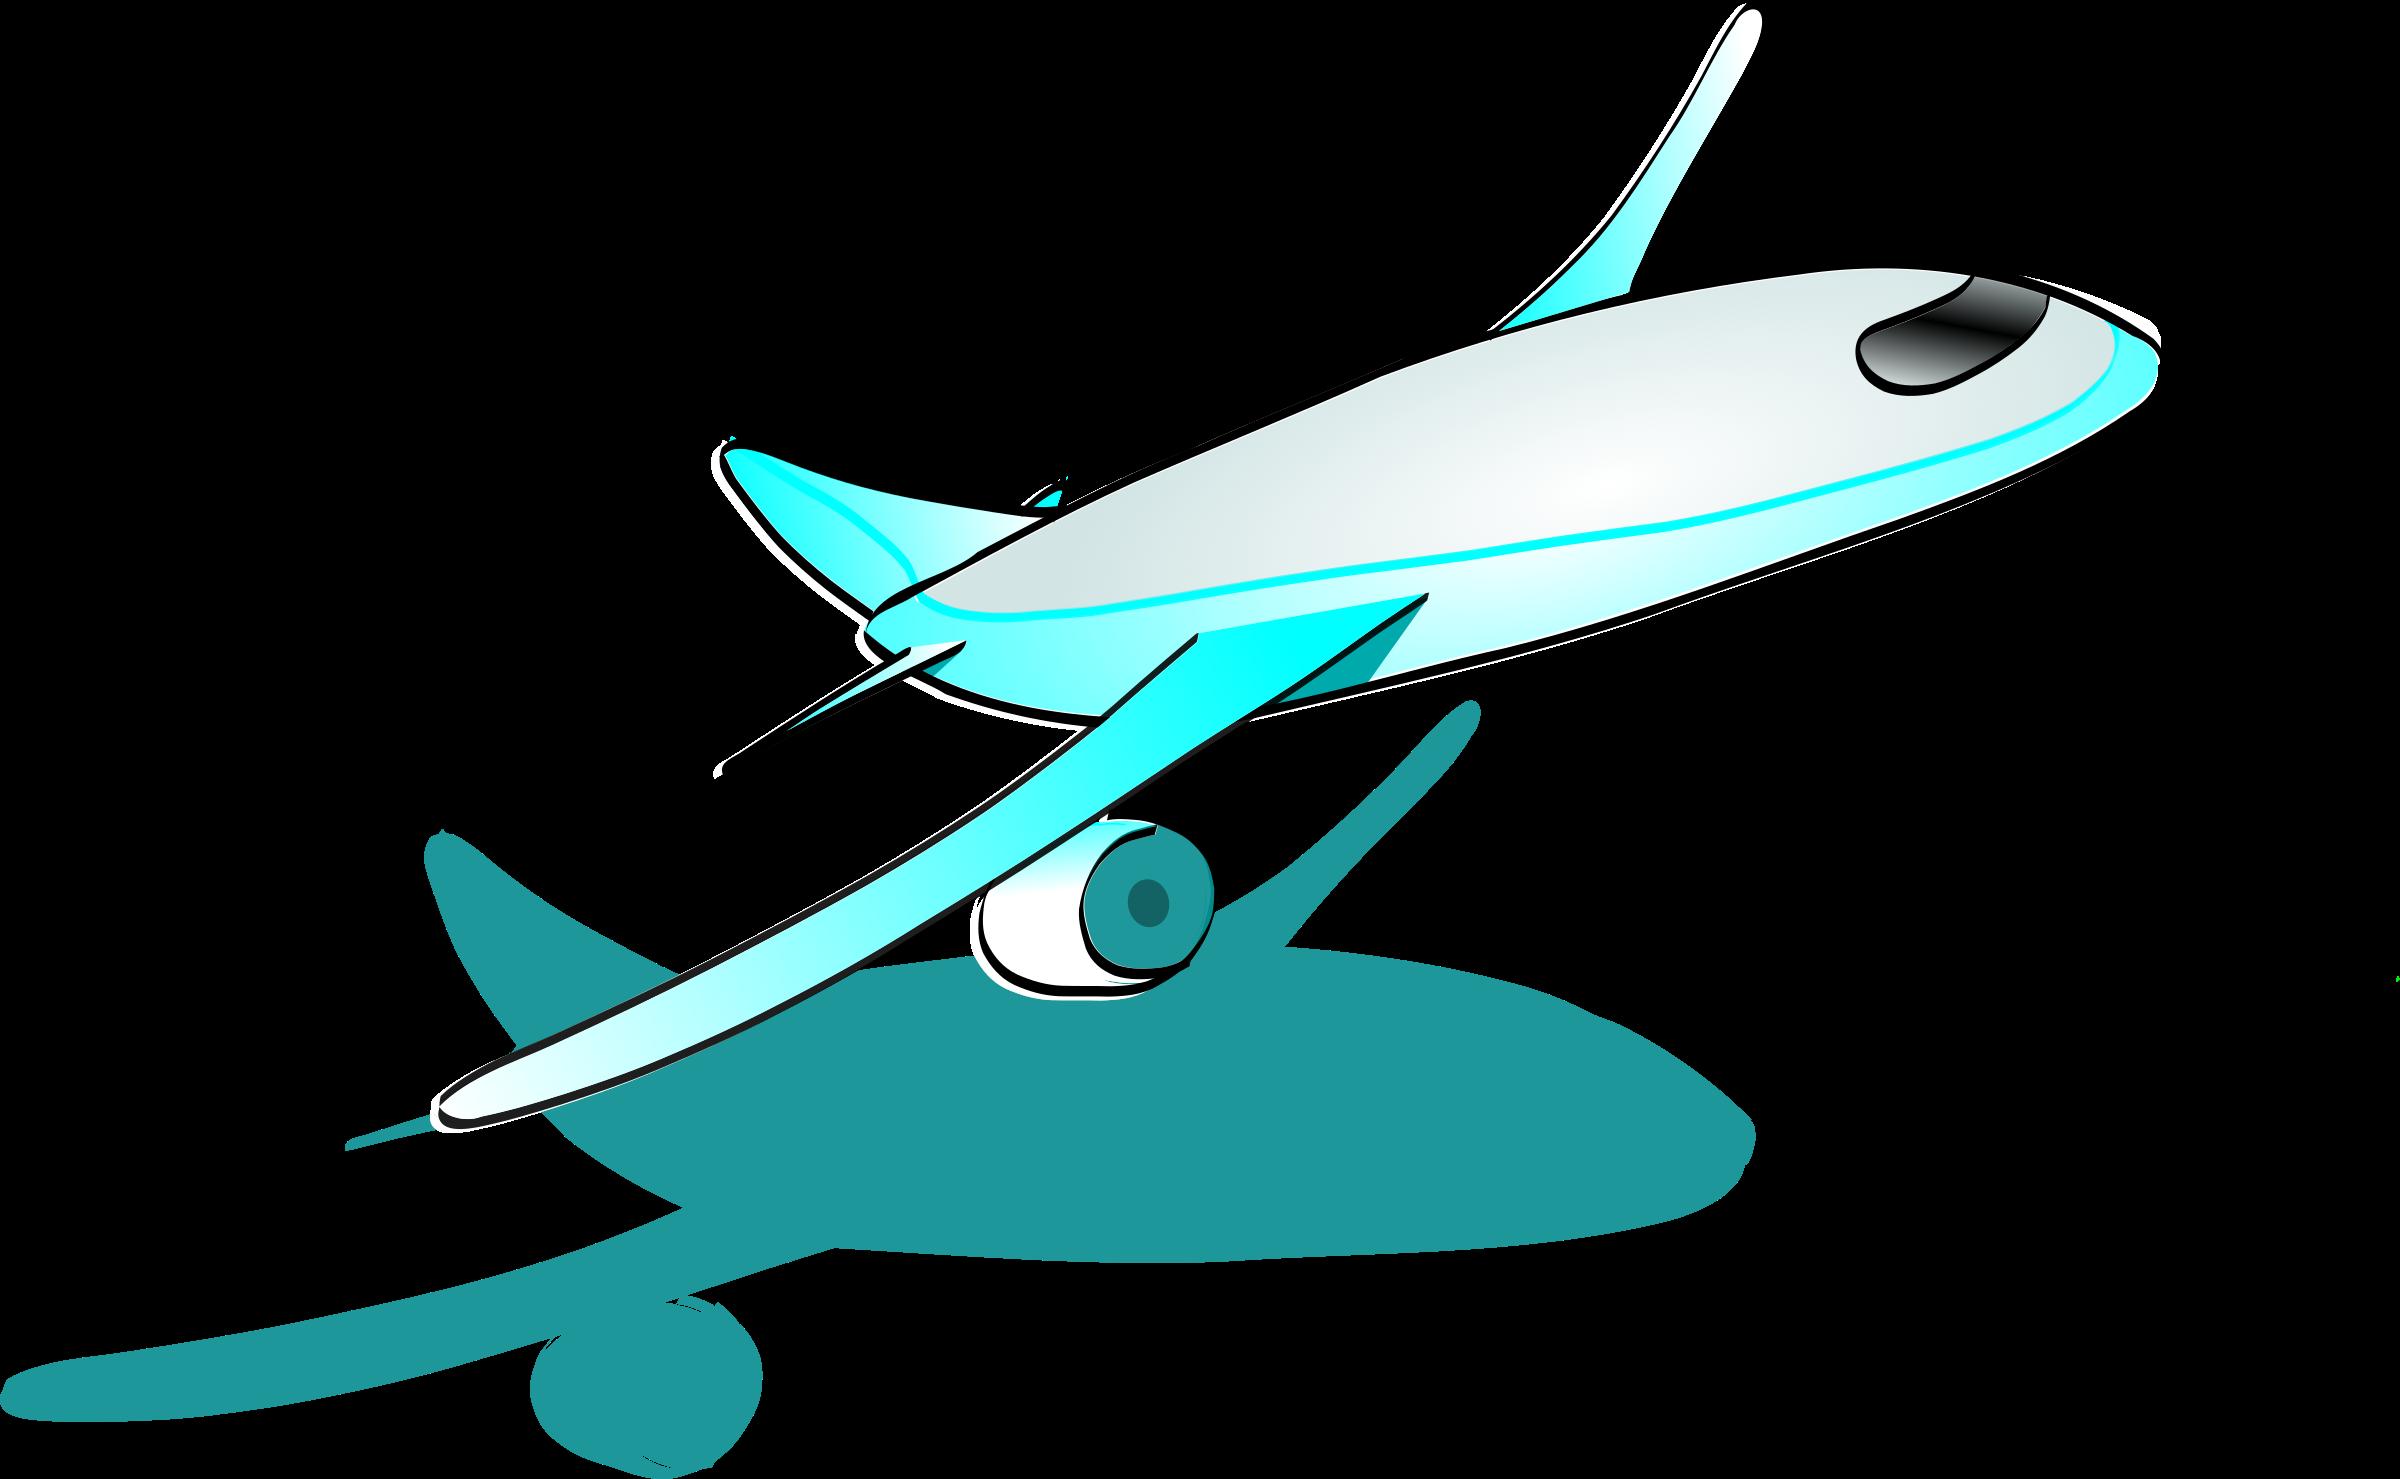 Purple clipart airplane. Plane taking off big